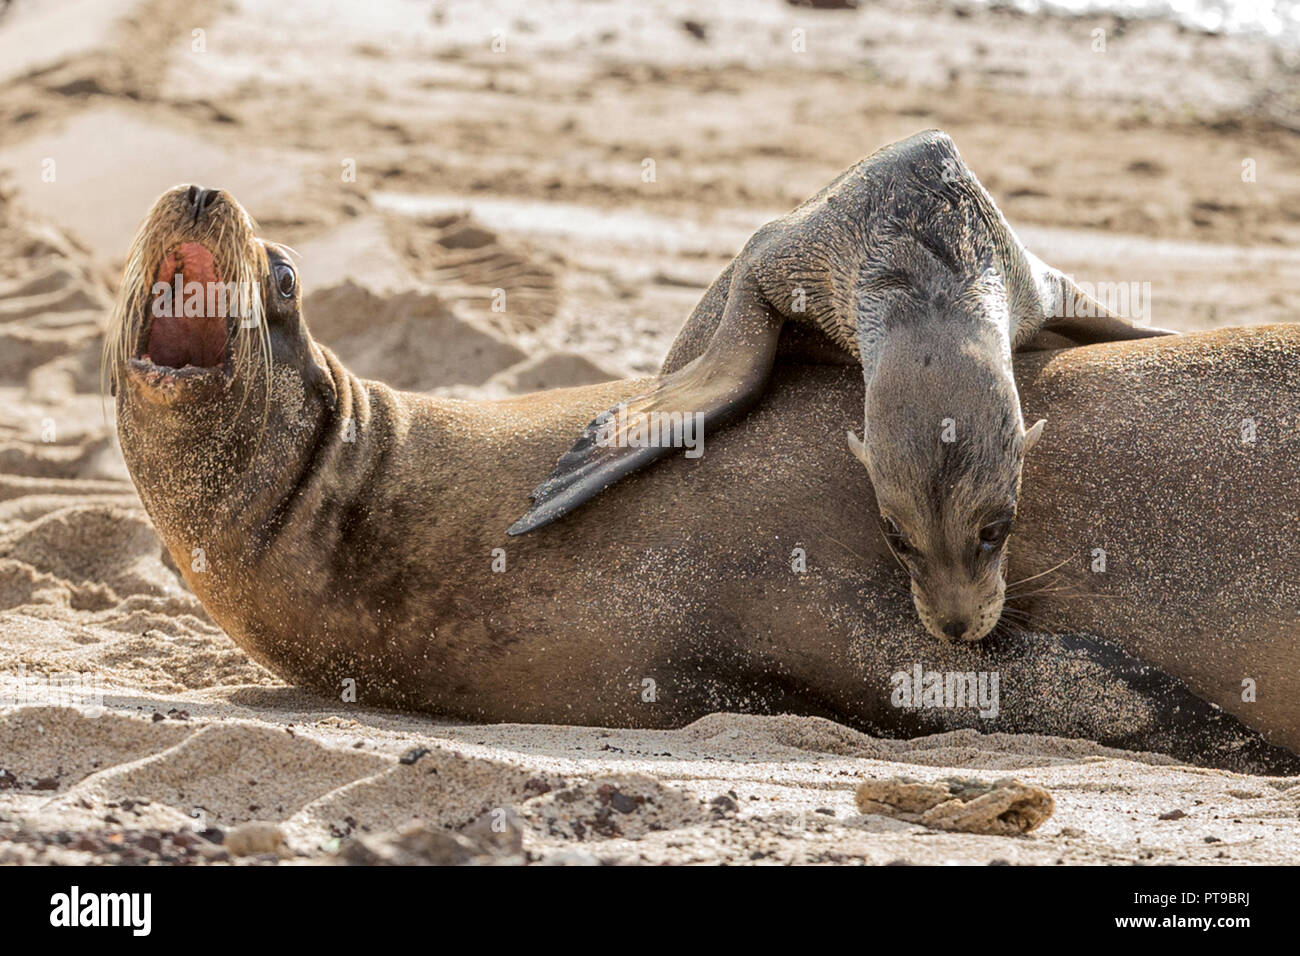 Sealion calf & mother showing aggression to pup requesting milk,  Puerto Baquerizo Moreno, San Cristobal island, Galapagos islands, Ecuador, - Stock Image